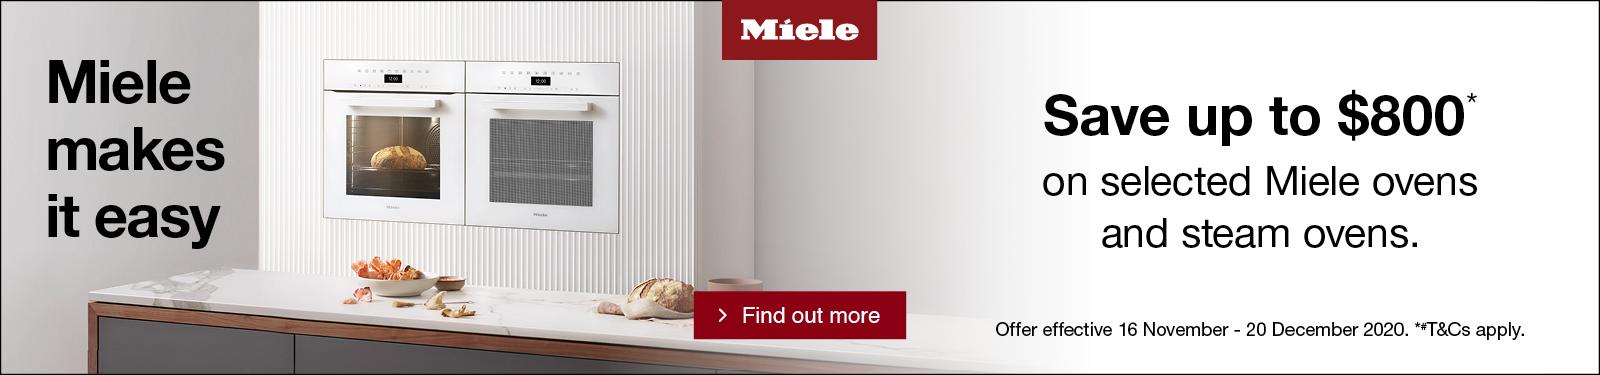 mi-9395-mca-banners-easy-living-cooking-novdec20-v2-1600x375.jpg